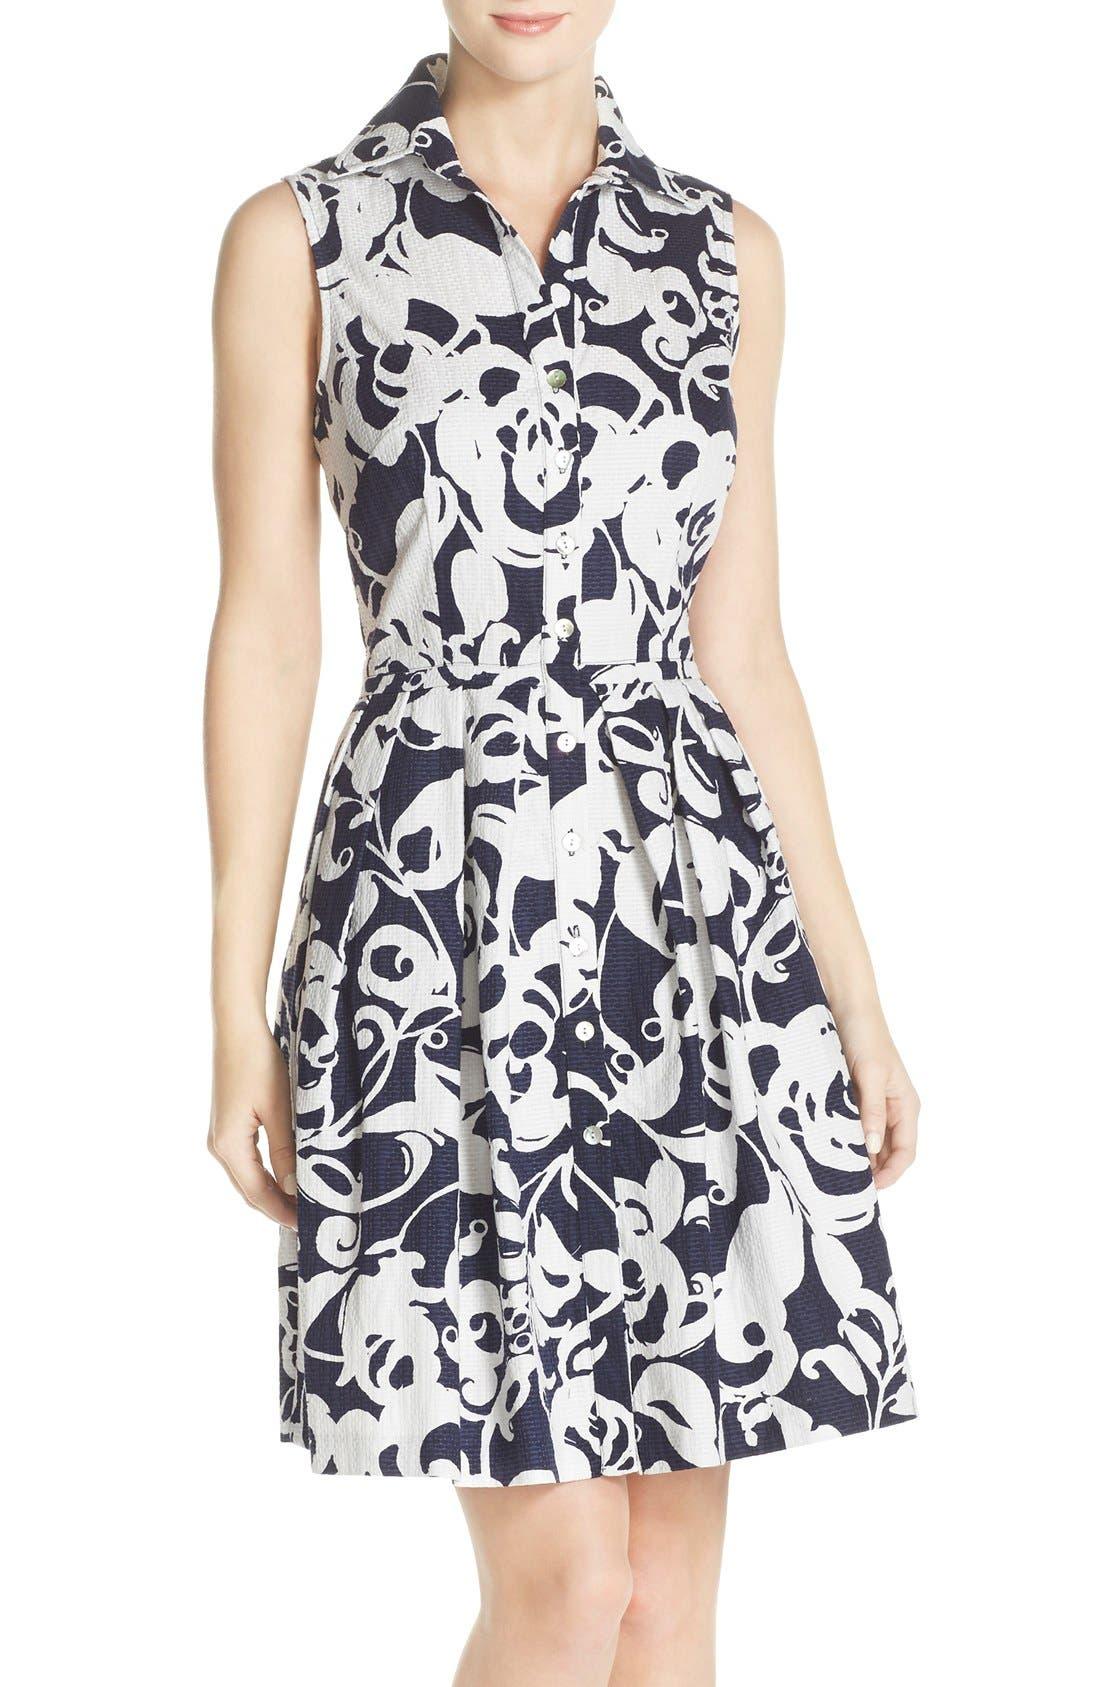 Alternate Image 1 Selected - Taylor Dresses Print Jacquard Fit & Flare Shirtdress